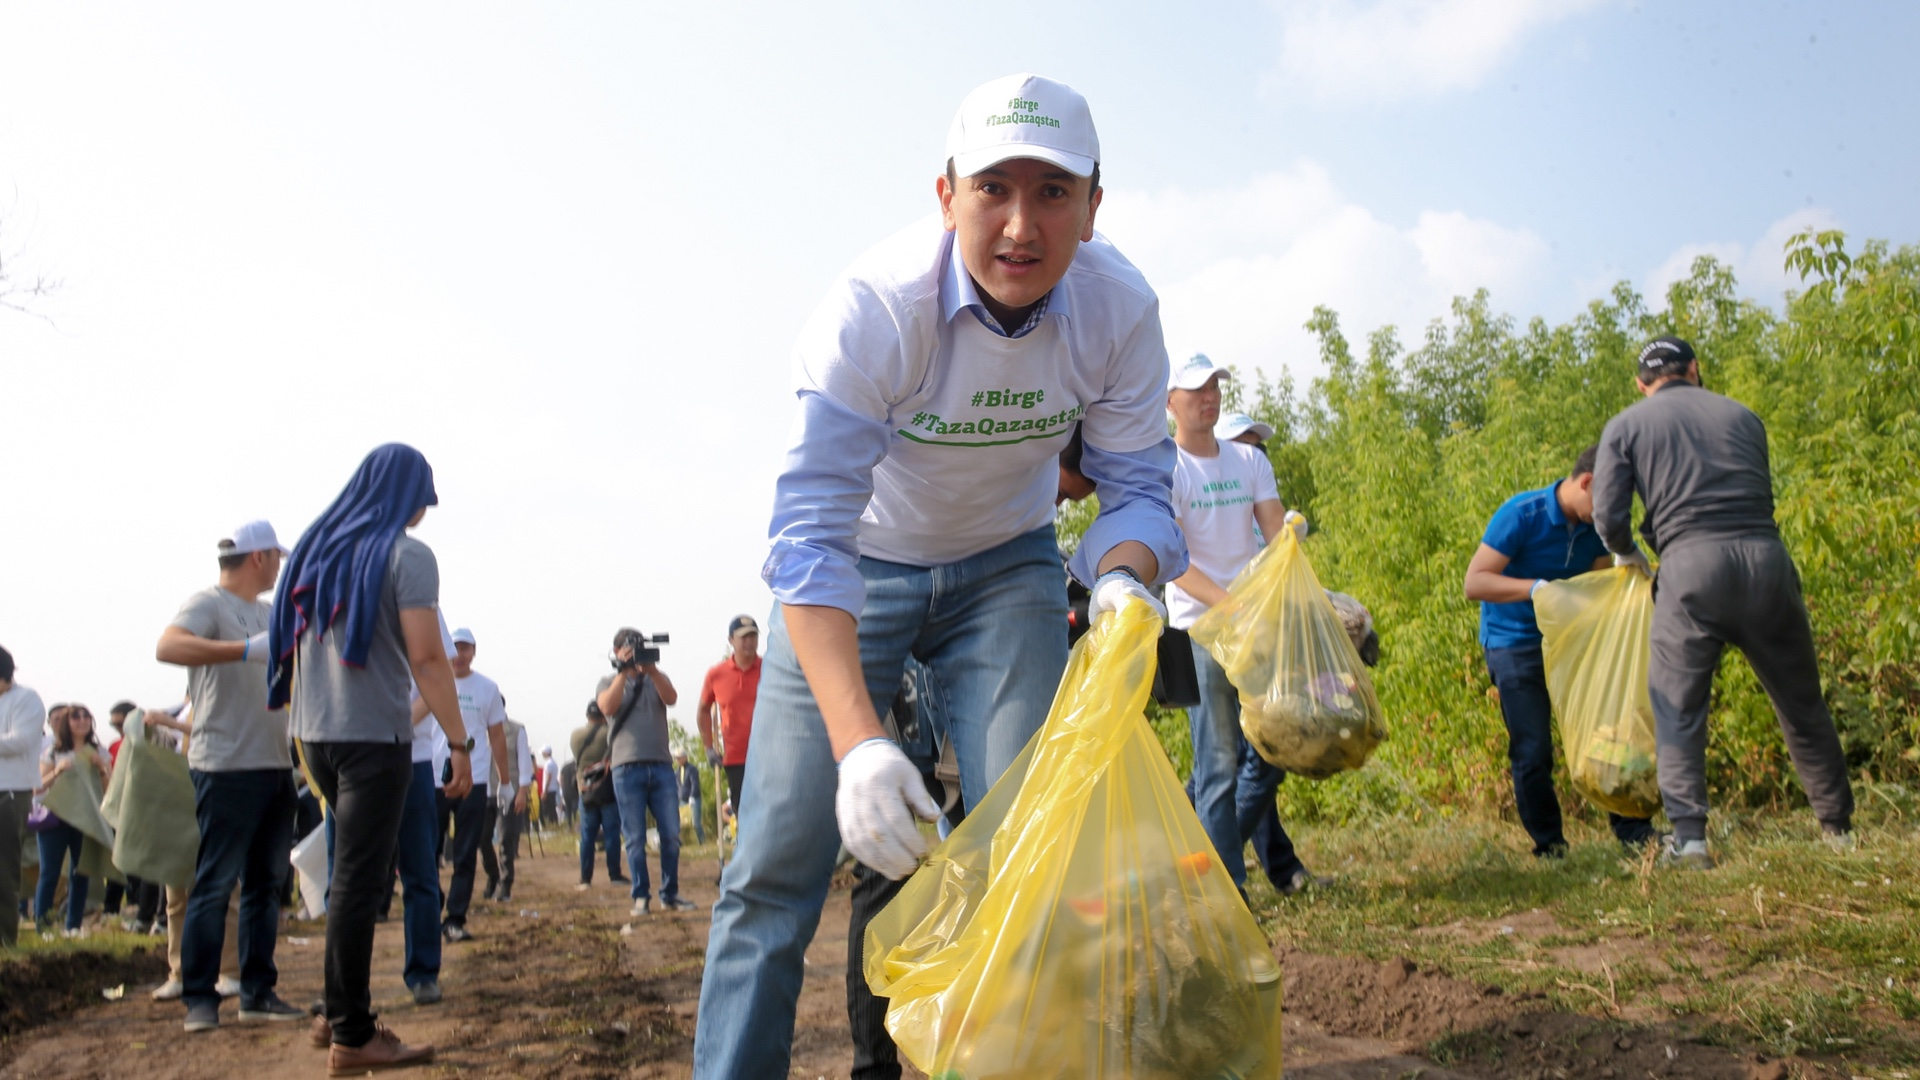 Правительство РК приняло участие в акции «Бірге – Таза Қазақстан»